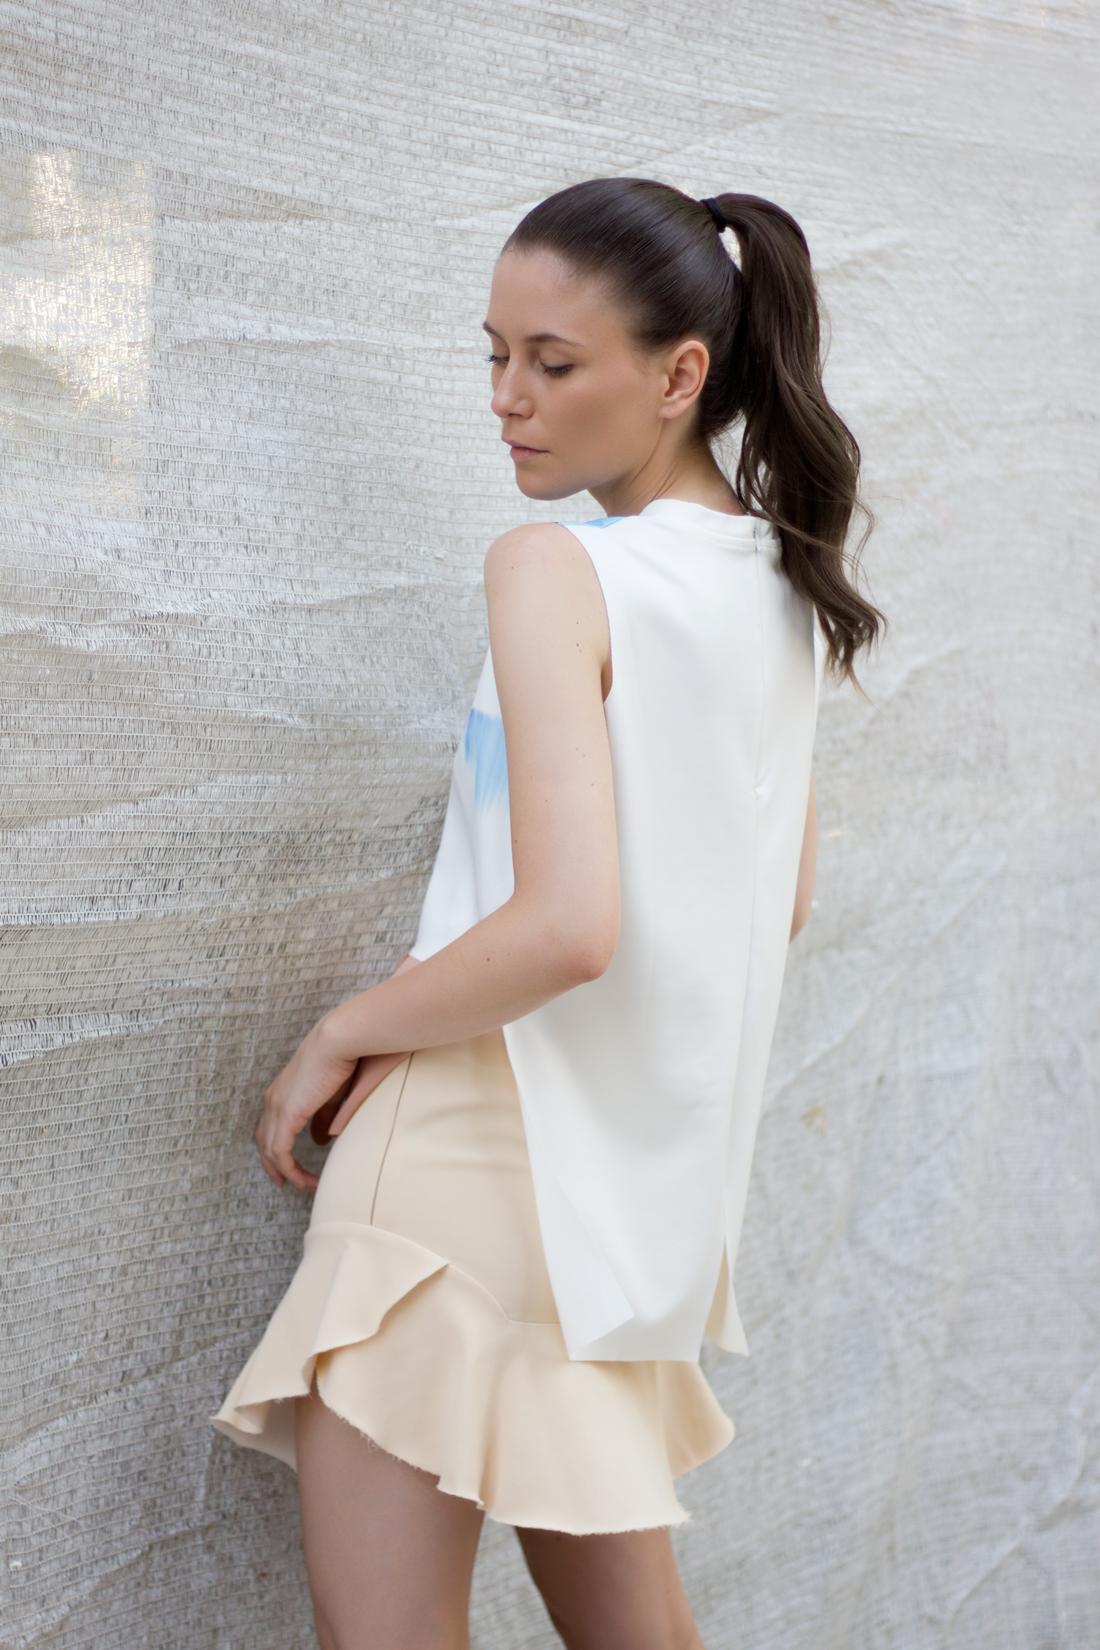 Zara Nude Skirt   Oasap Top   AfterTwoFive.com